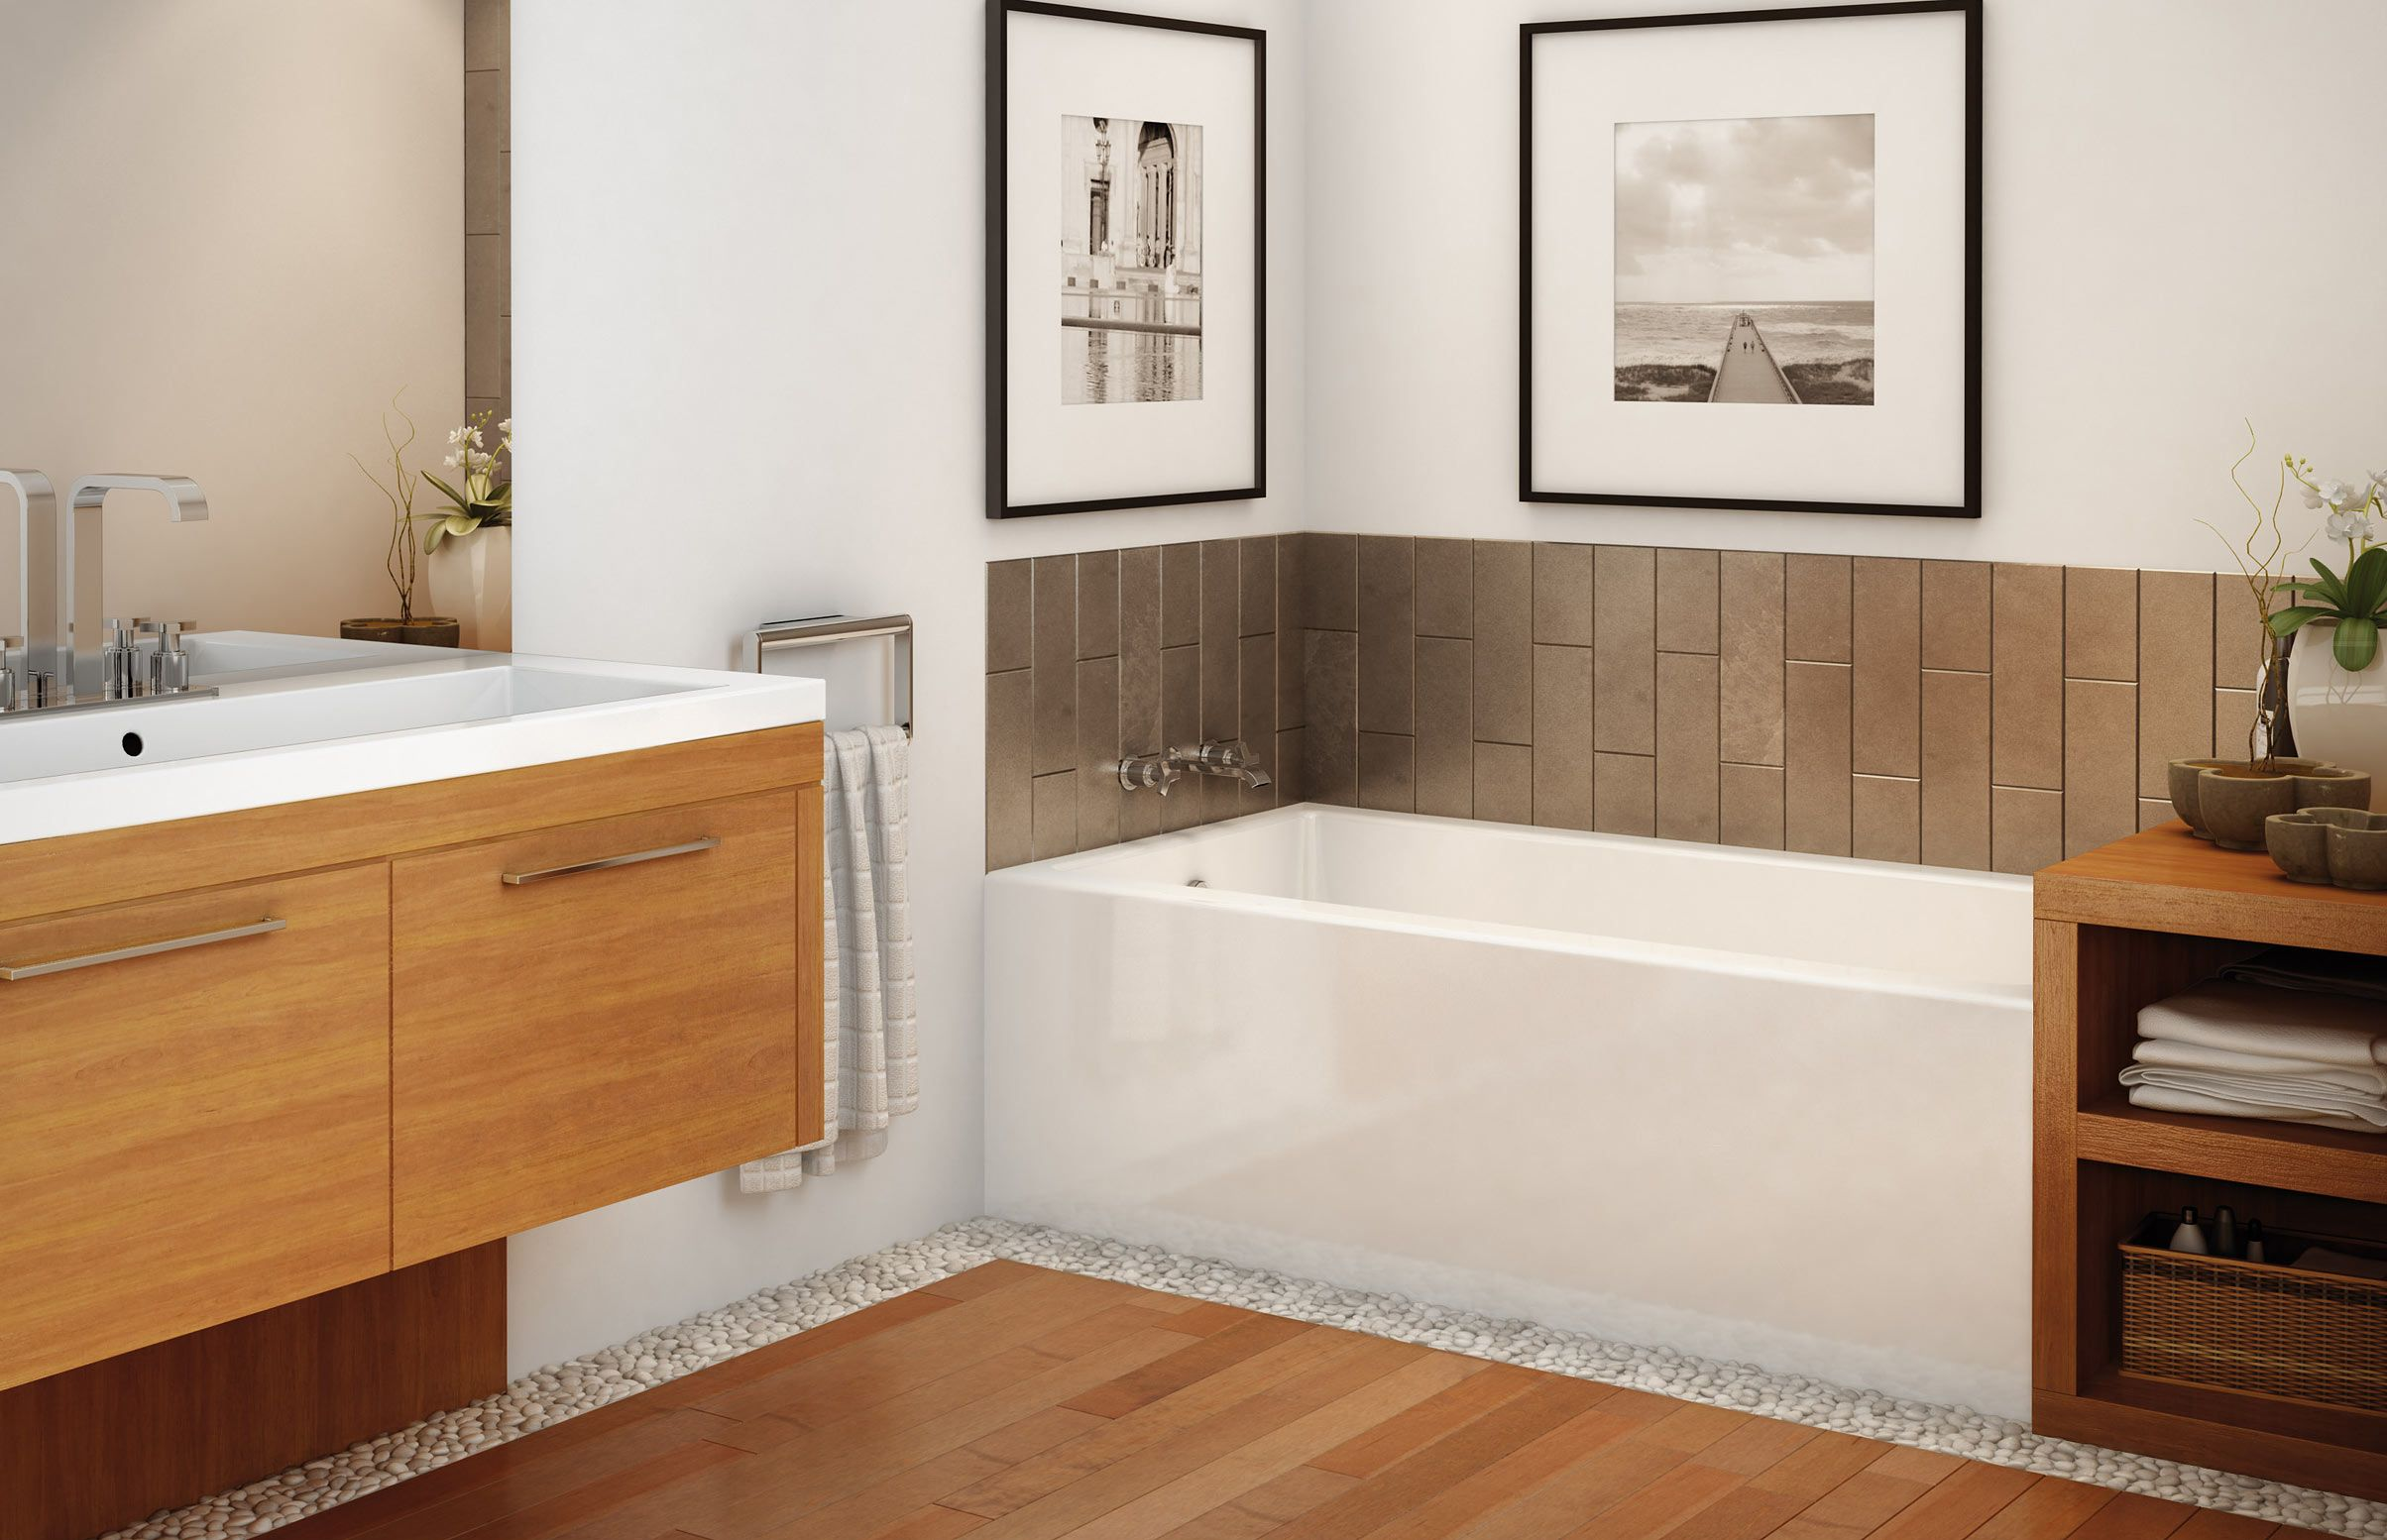 mirabelle catalonia in tubs tub trinidad series category firplak bathtub bathtubs island